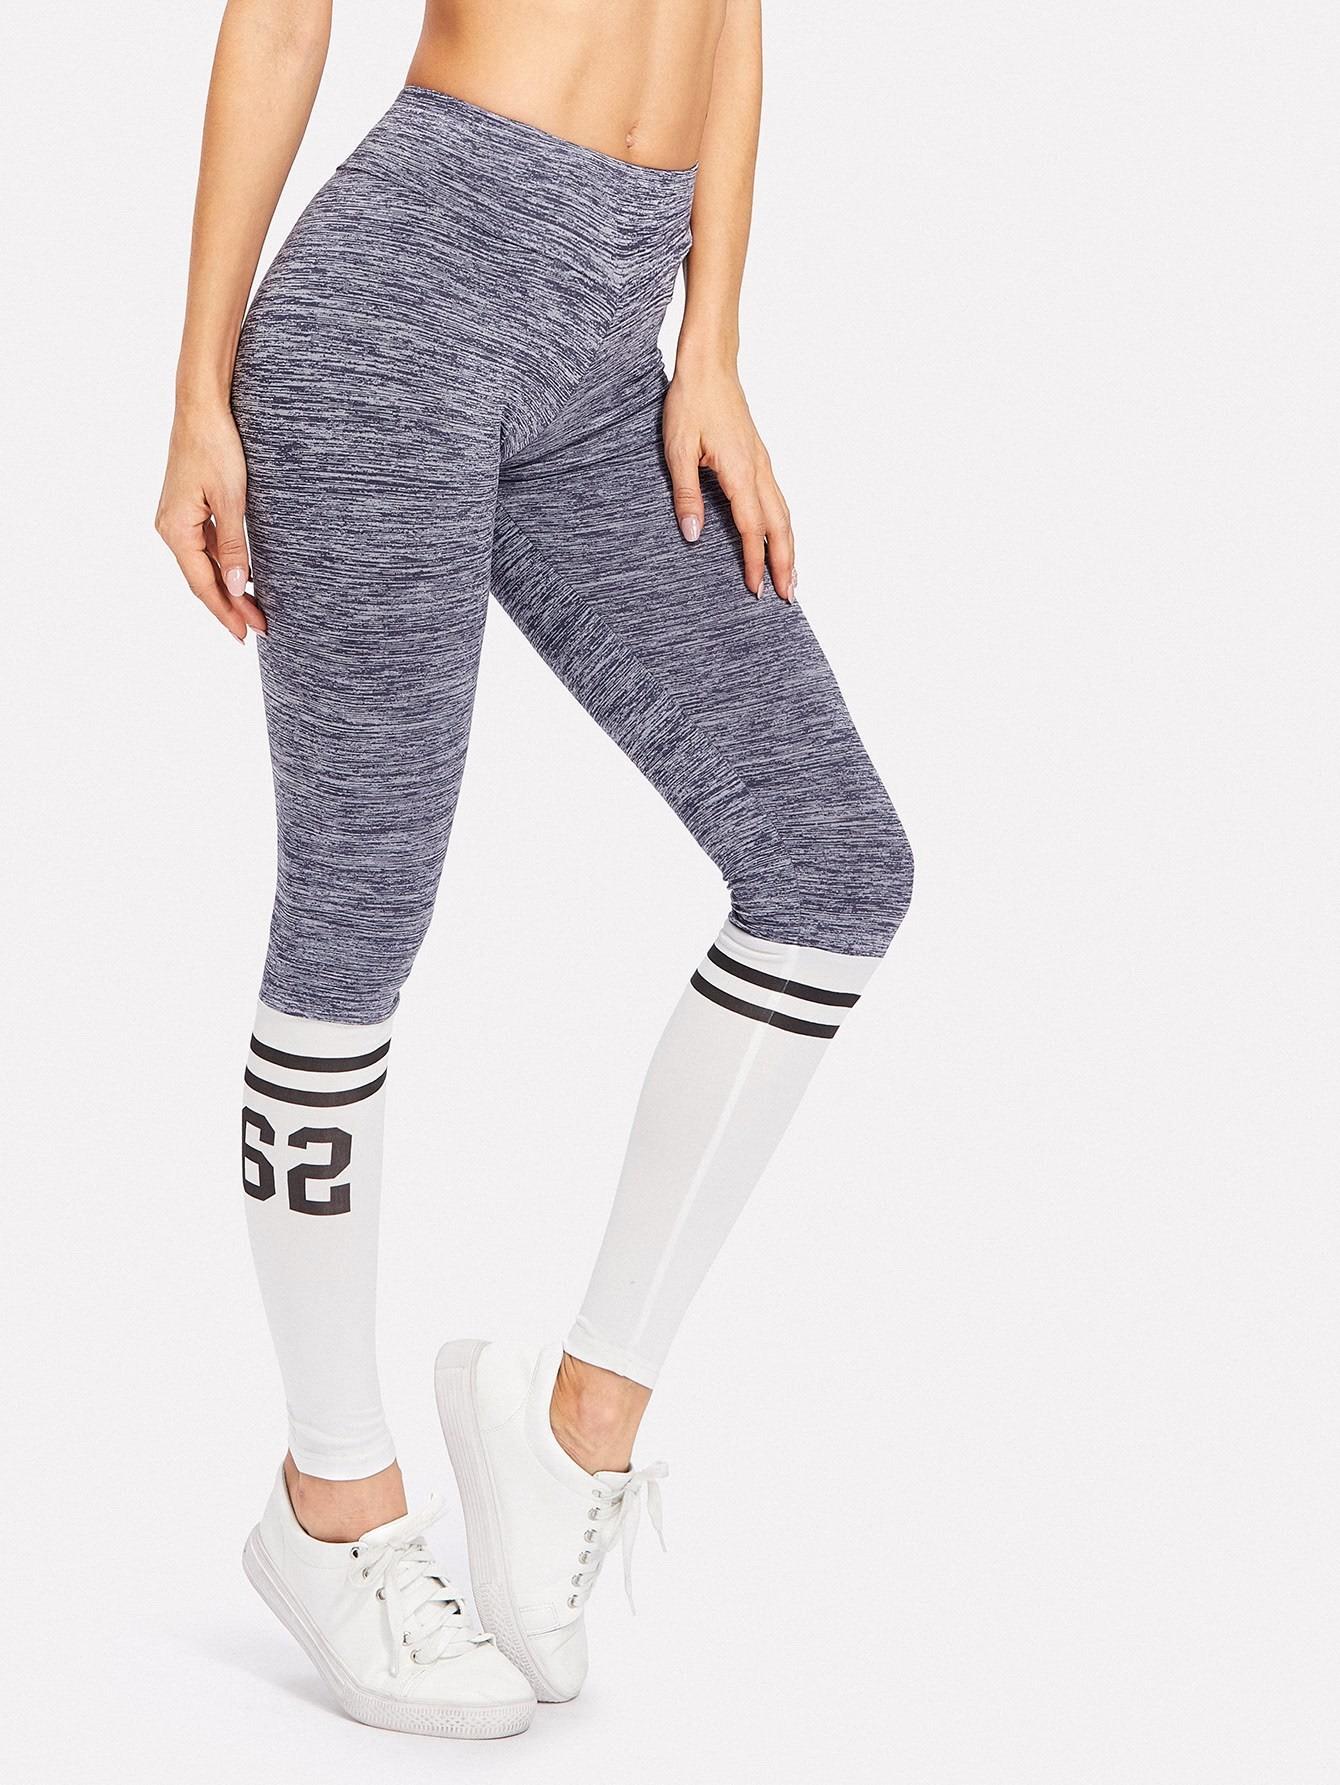 Varsity Print Space Dye Leggings slogan print space dye pajama set